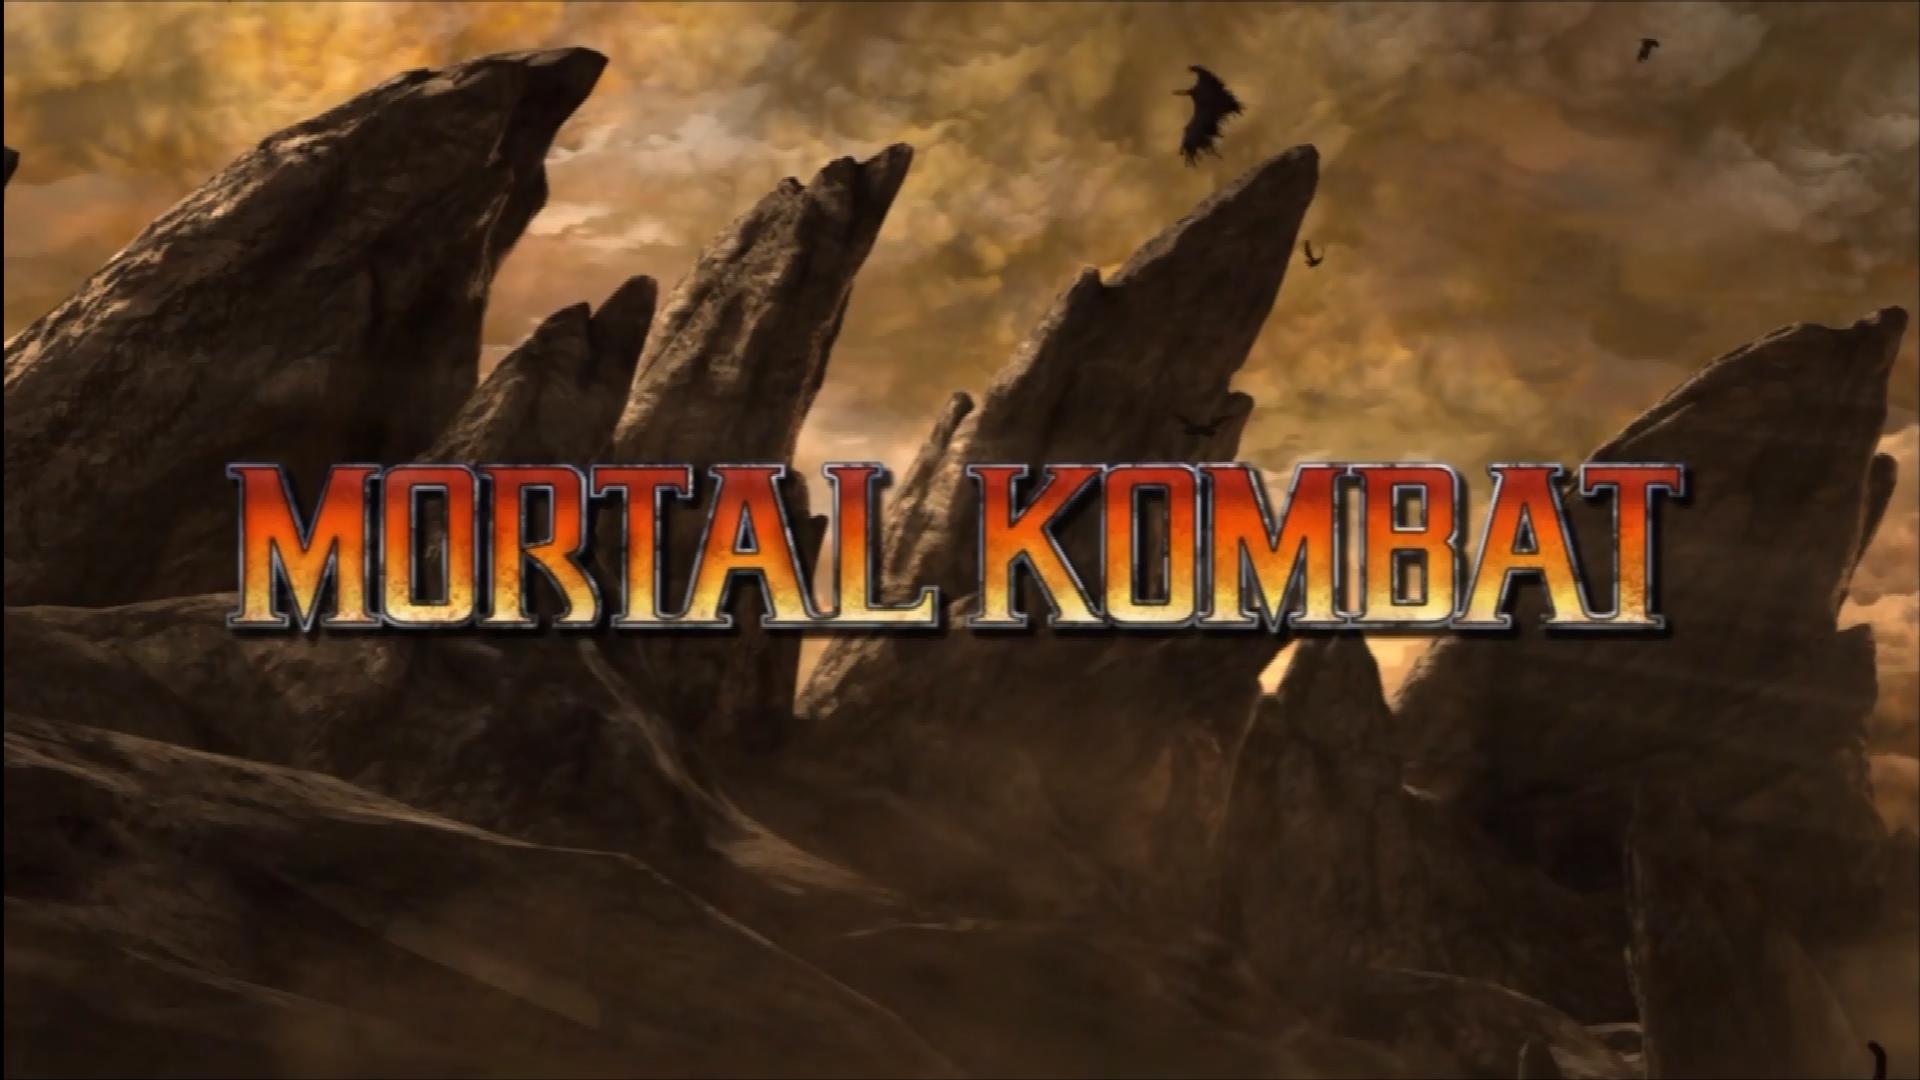 Mortal Kombat (2011)'s Story Mode | Mortal Kombat Wiki